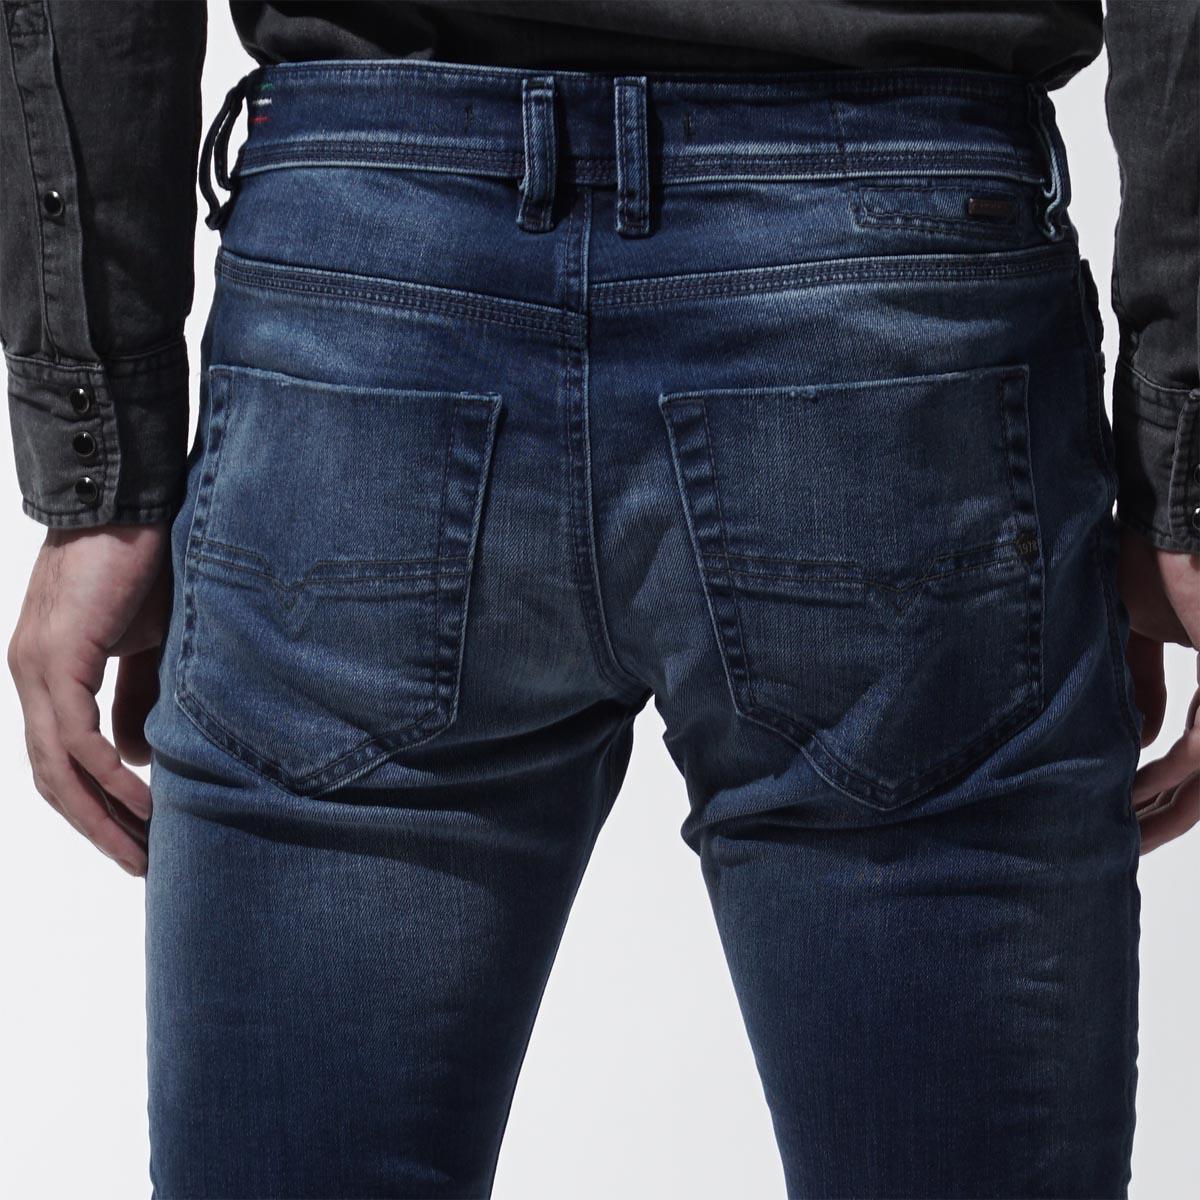 Diesel DIESEL button fried food jeans DIESEL DNA TEPPHAR SLIM CARROT indigo blue blue system tepphar 00ckri 084bw men